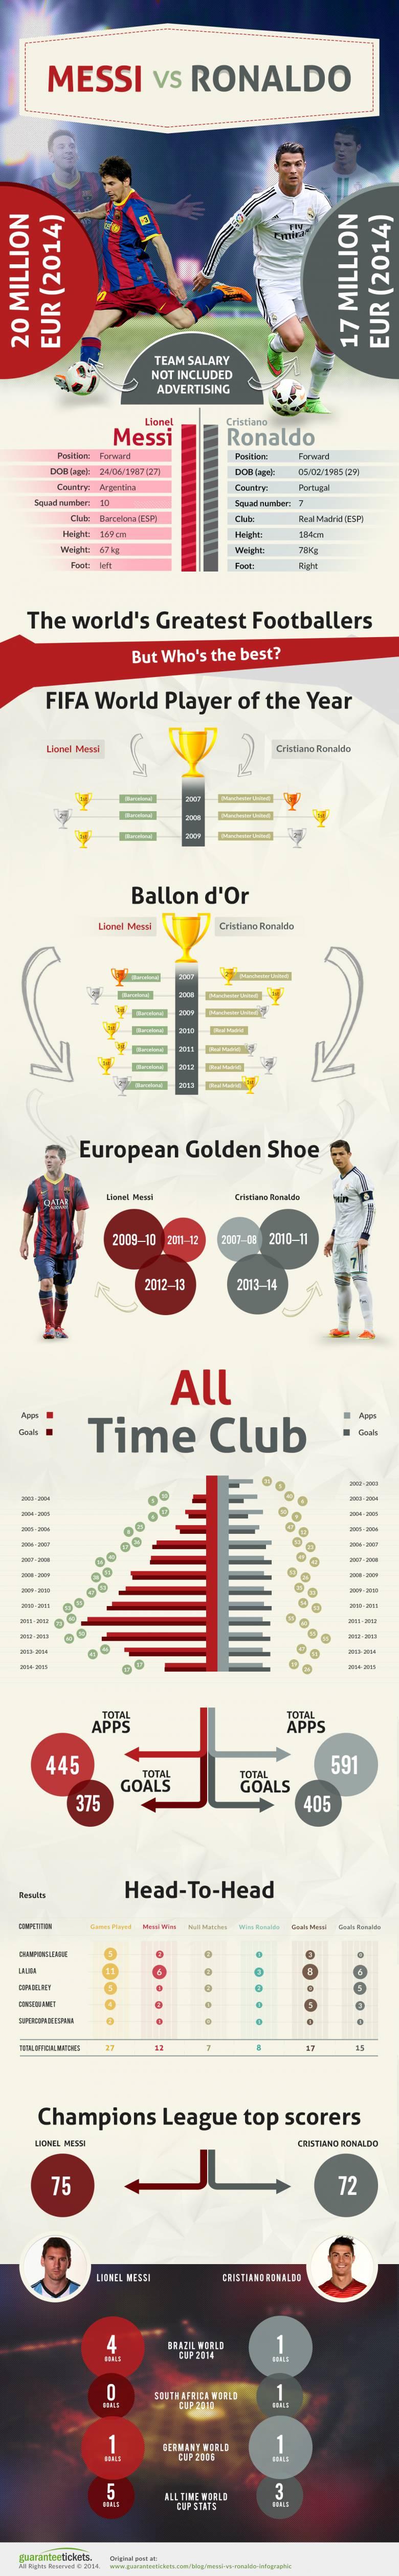 Messi Ronaldo Infographic